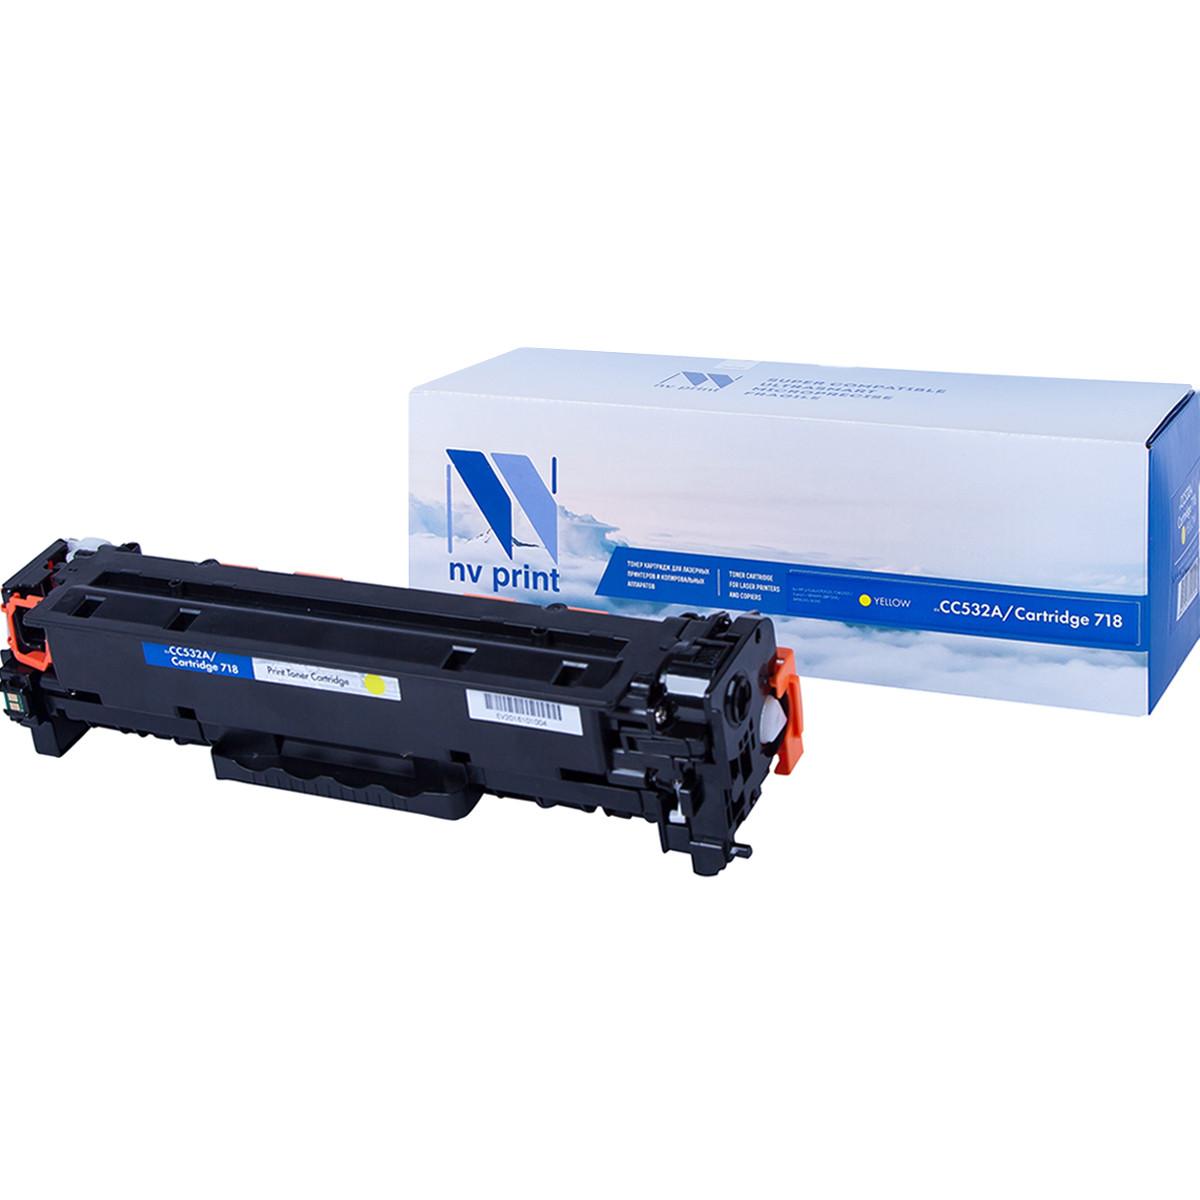 Картридж NVP совместимый HP CC532A/Canon 718 Yellow для LaserJet Color CP2025/CP2025dn/CP2025n/MFP-CM2320fx/CM2320n/Canon MF724Cdw/MF728Cdw  i-SENSYS